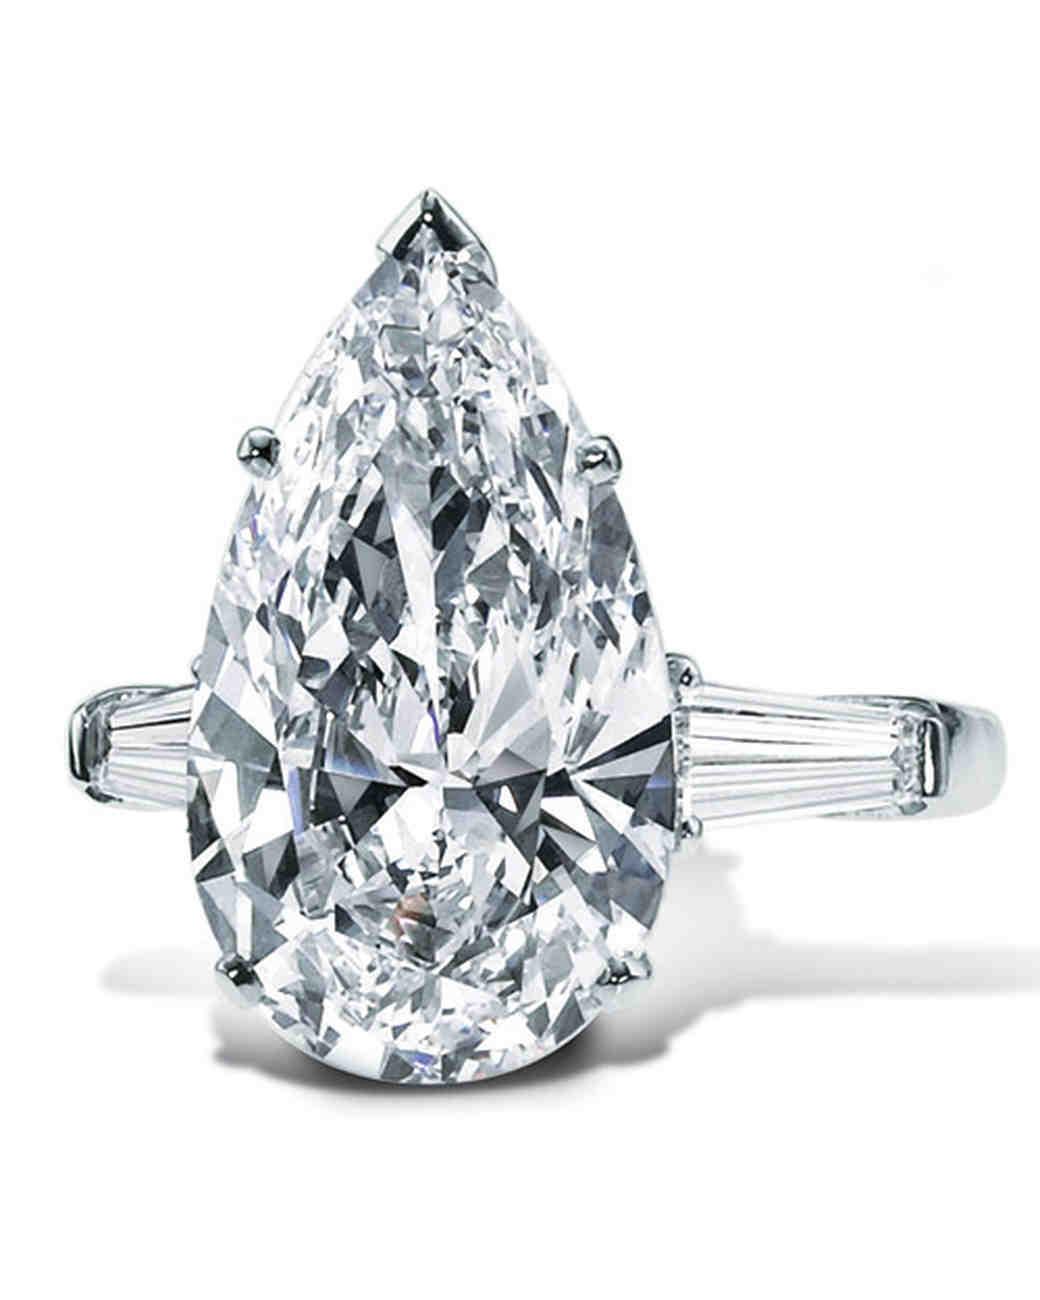 Heart Shaped Diamond Weding Rings 014 - Heart Shaped Diamond Weding Rings